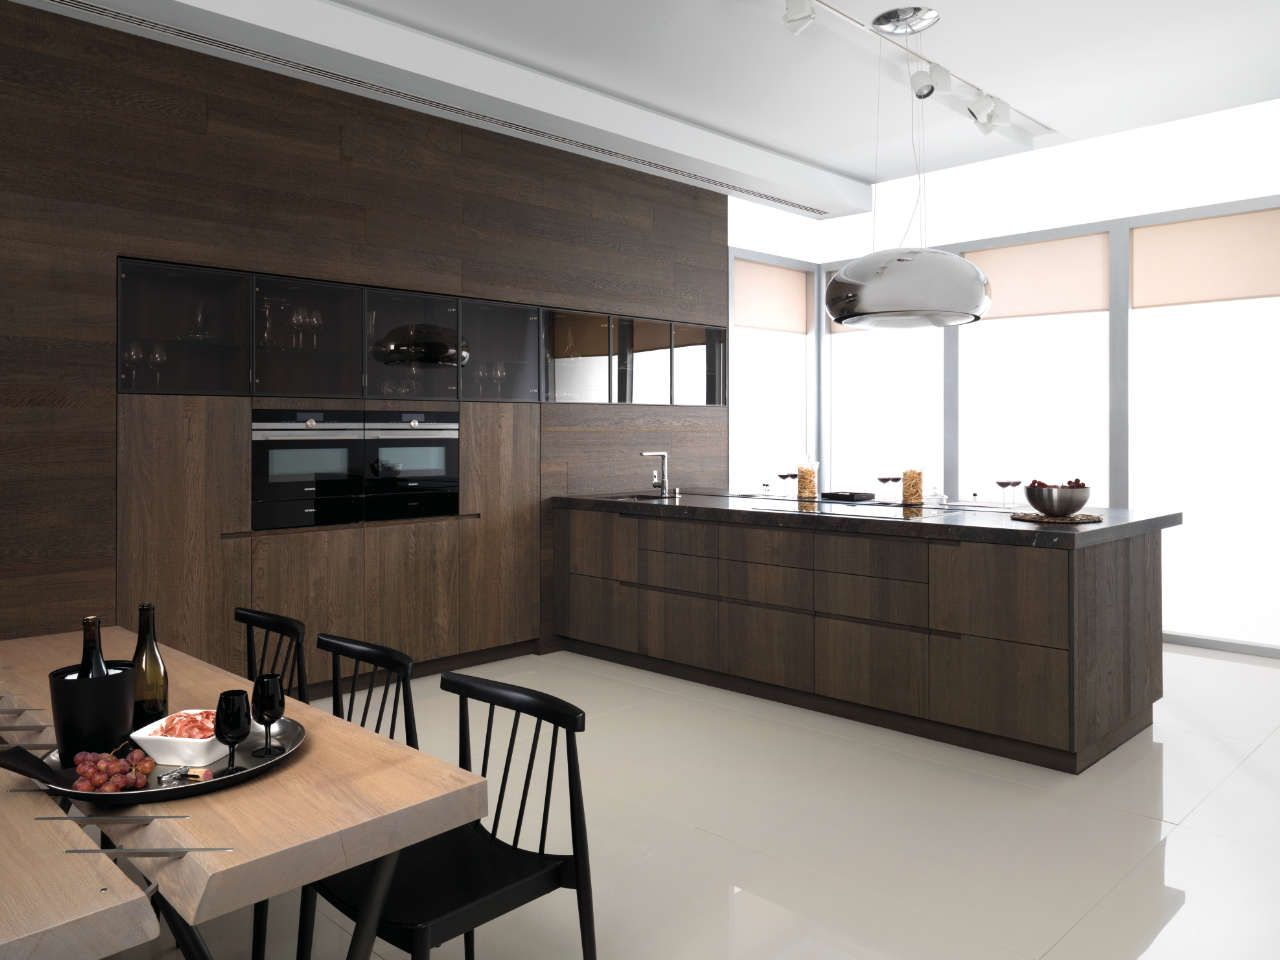 Gamadecor Porcelanosa Mobiliario Cocina 16625 Jpg 1 280 960 Pixels Interior Design Kitchen Kitchen Inspirations Luxury Kitchen Design